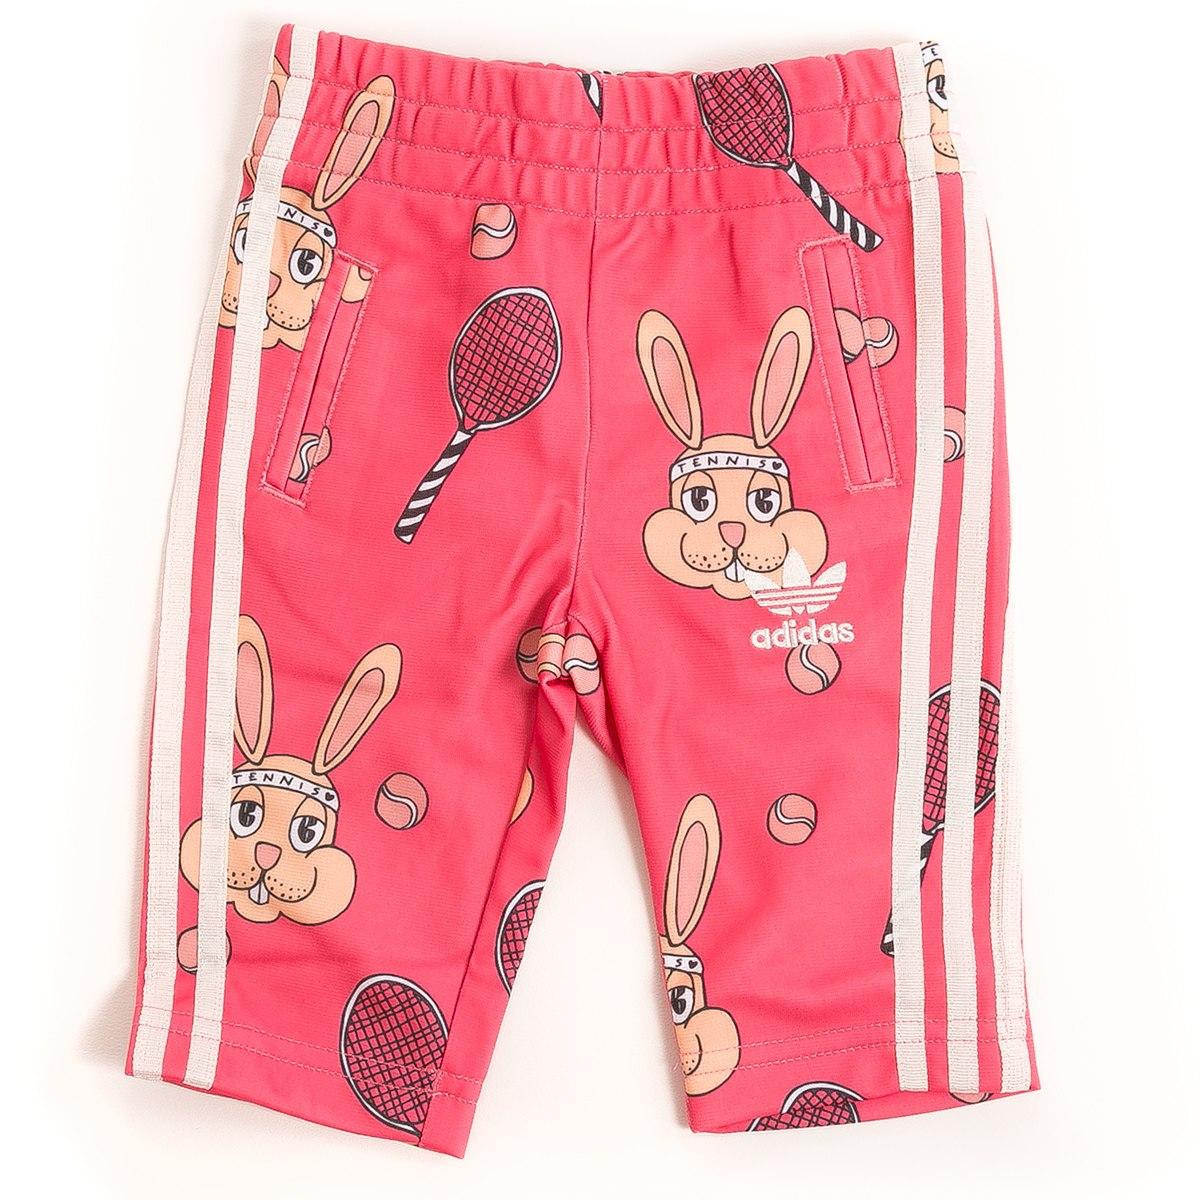 914a12c04f2867 conjunto originals mini rodini sst rosa adidas originals. Cargando zoom.